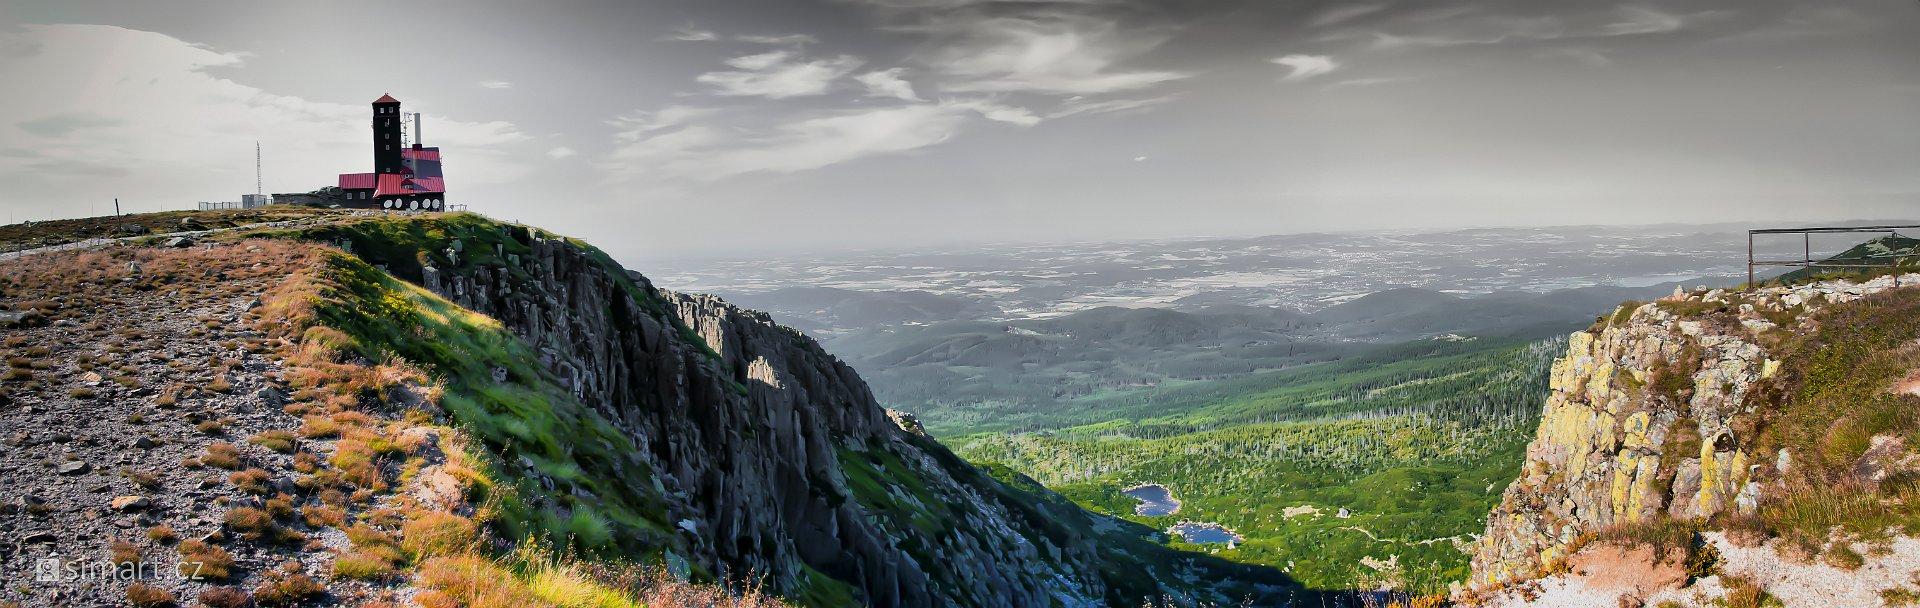 slides/Panorama_Snehove_jamy01.jpg Panorama, Toulky Panorama_Snehove_jamy01